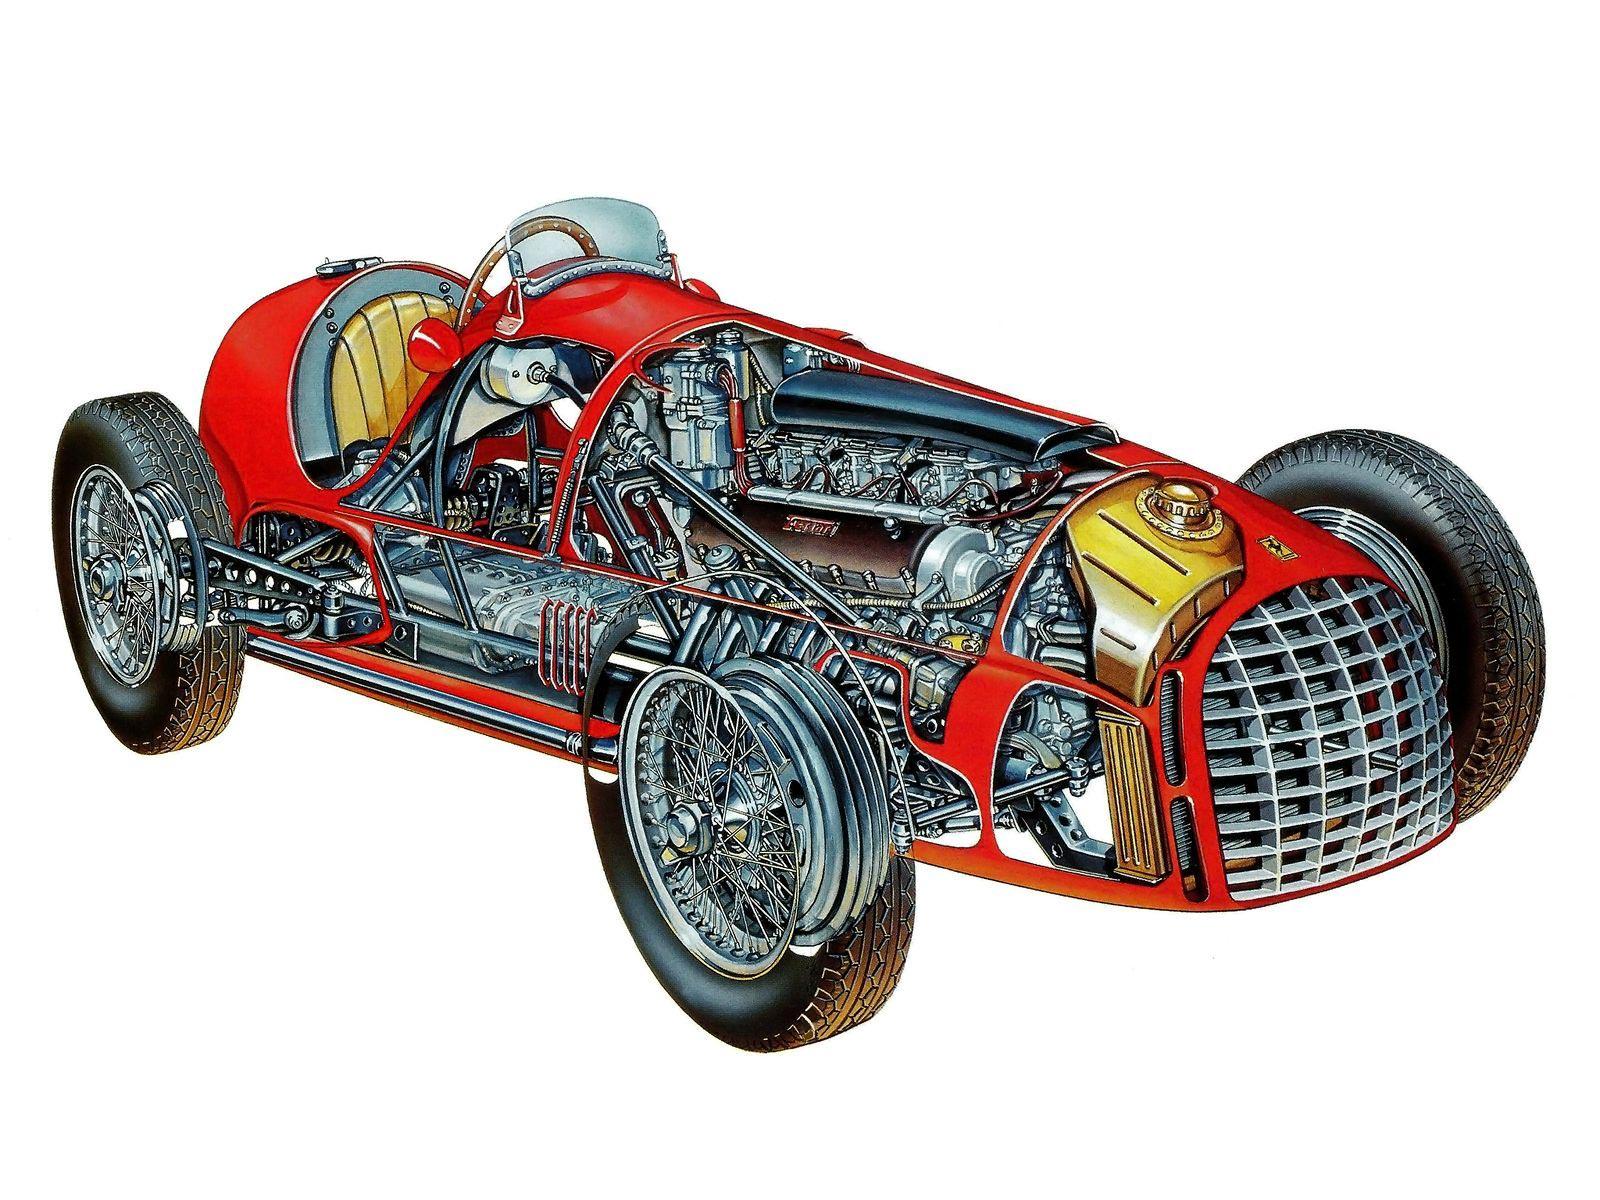 Ferrari 166 F2 cutaway drawing